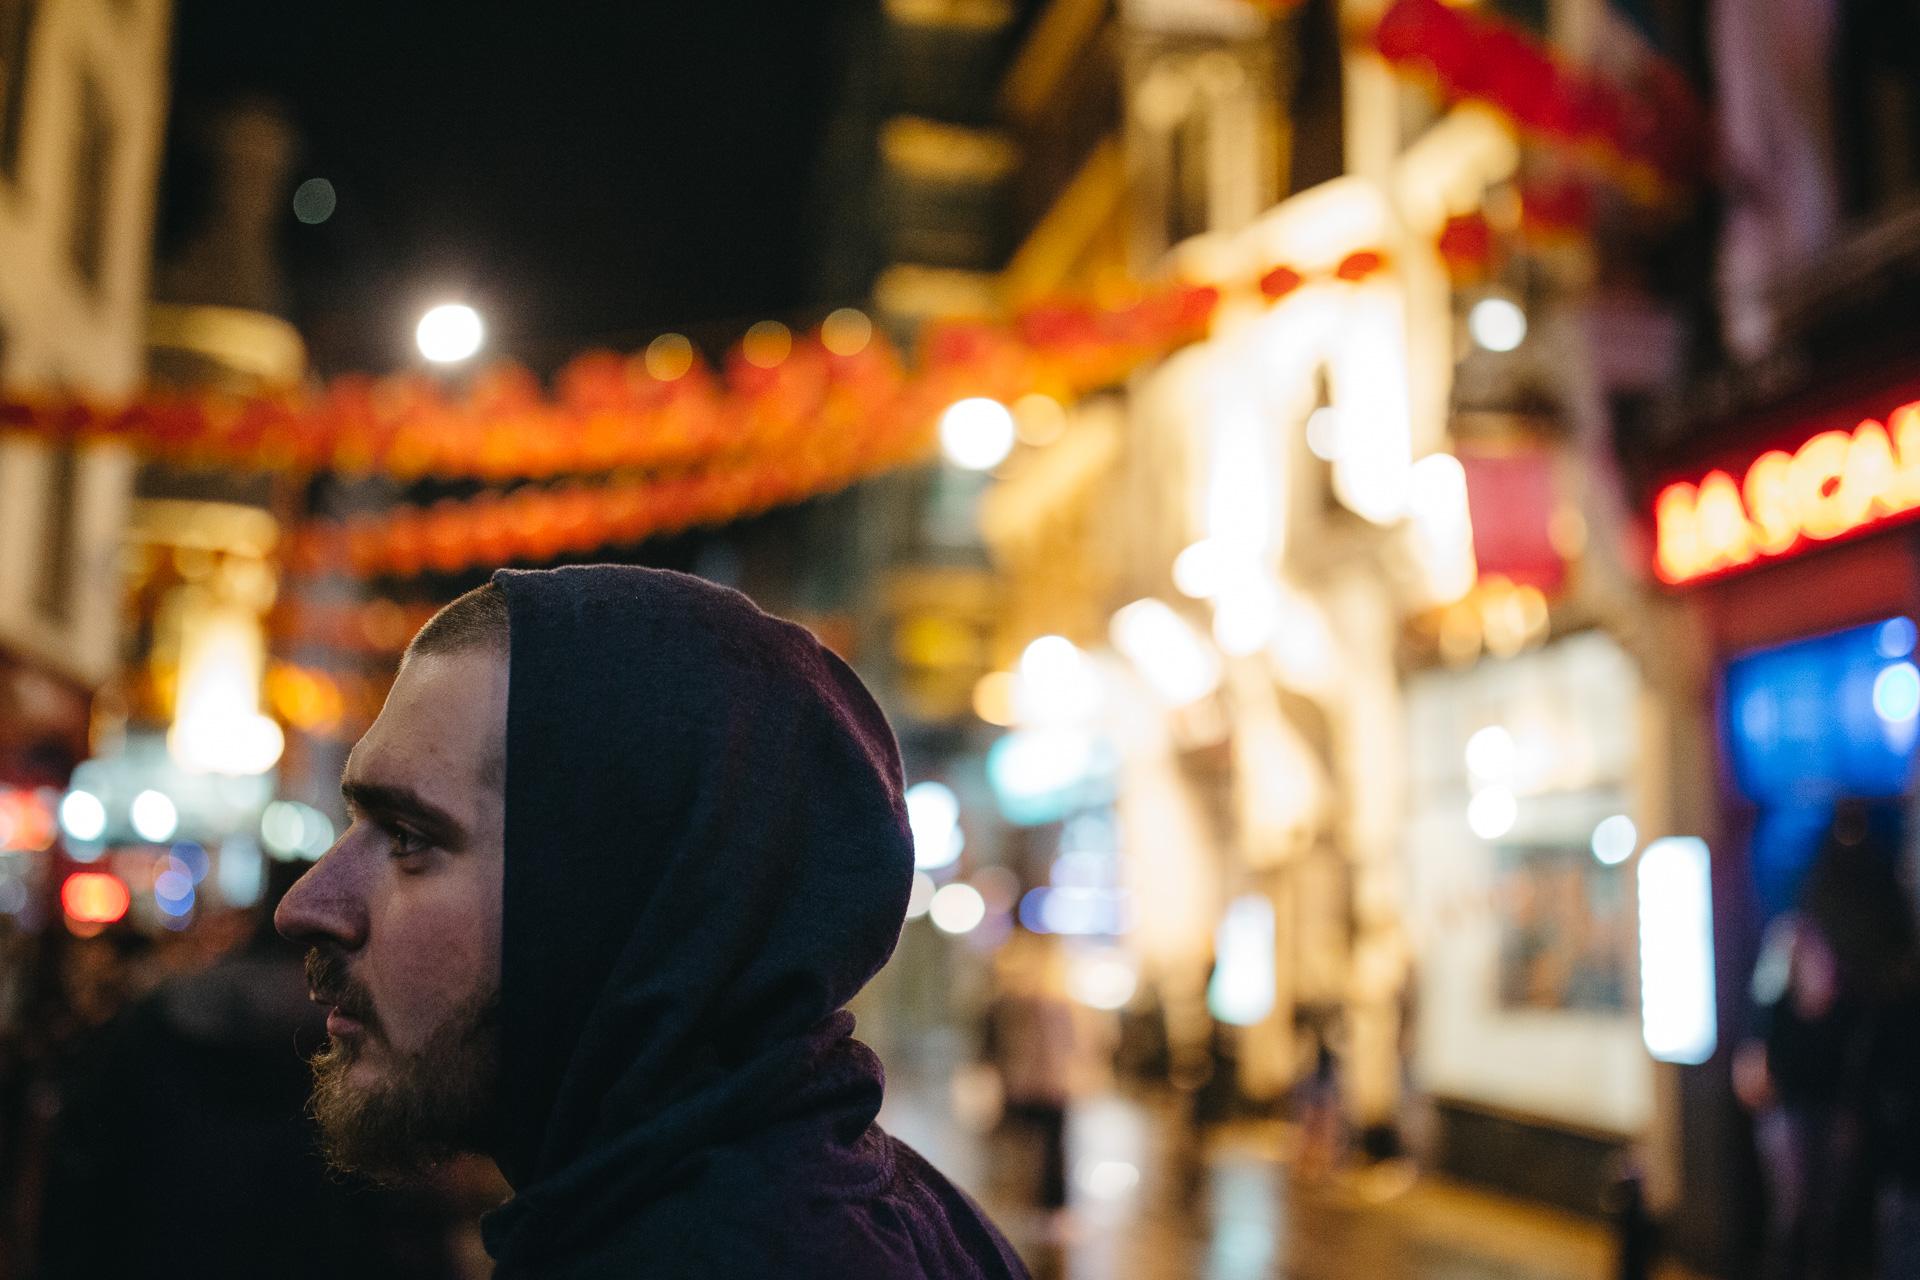 gabor_lenart_london_photographer_street_blogger_lifestyle_img_5261